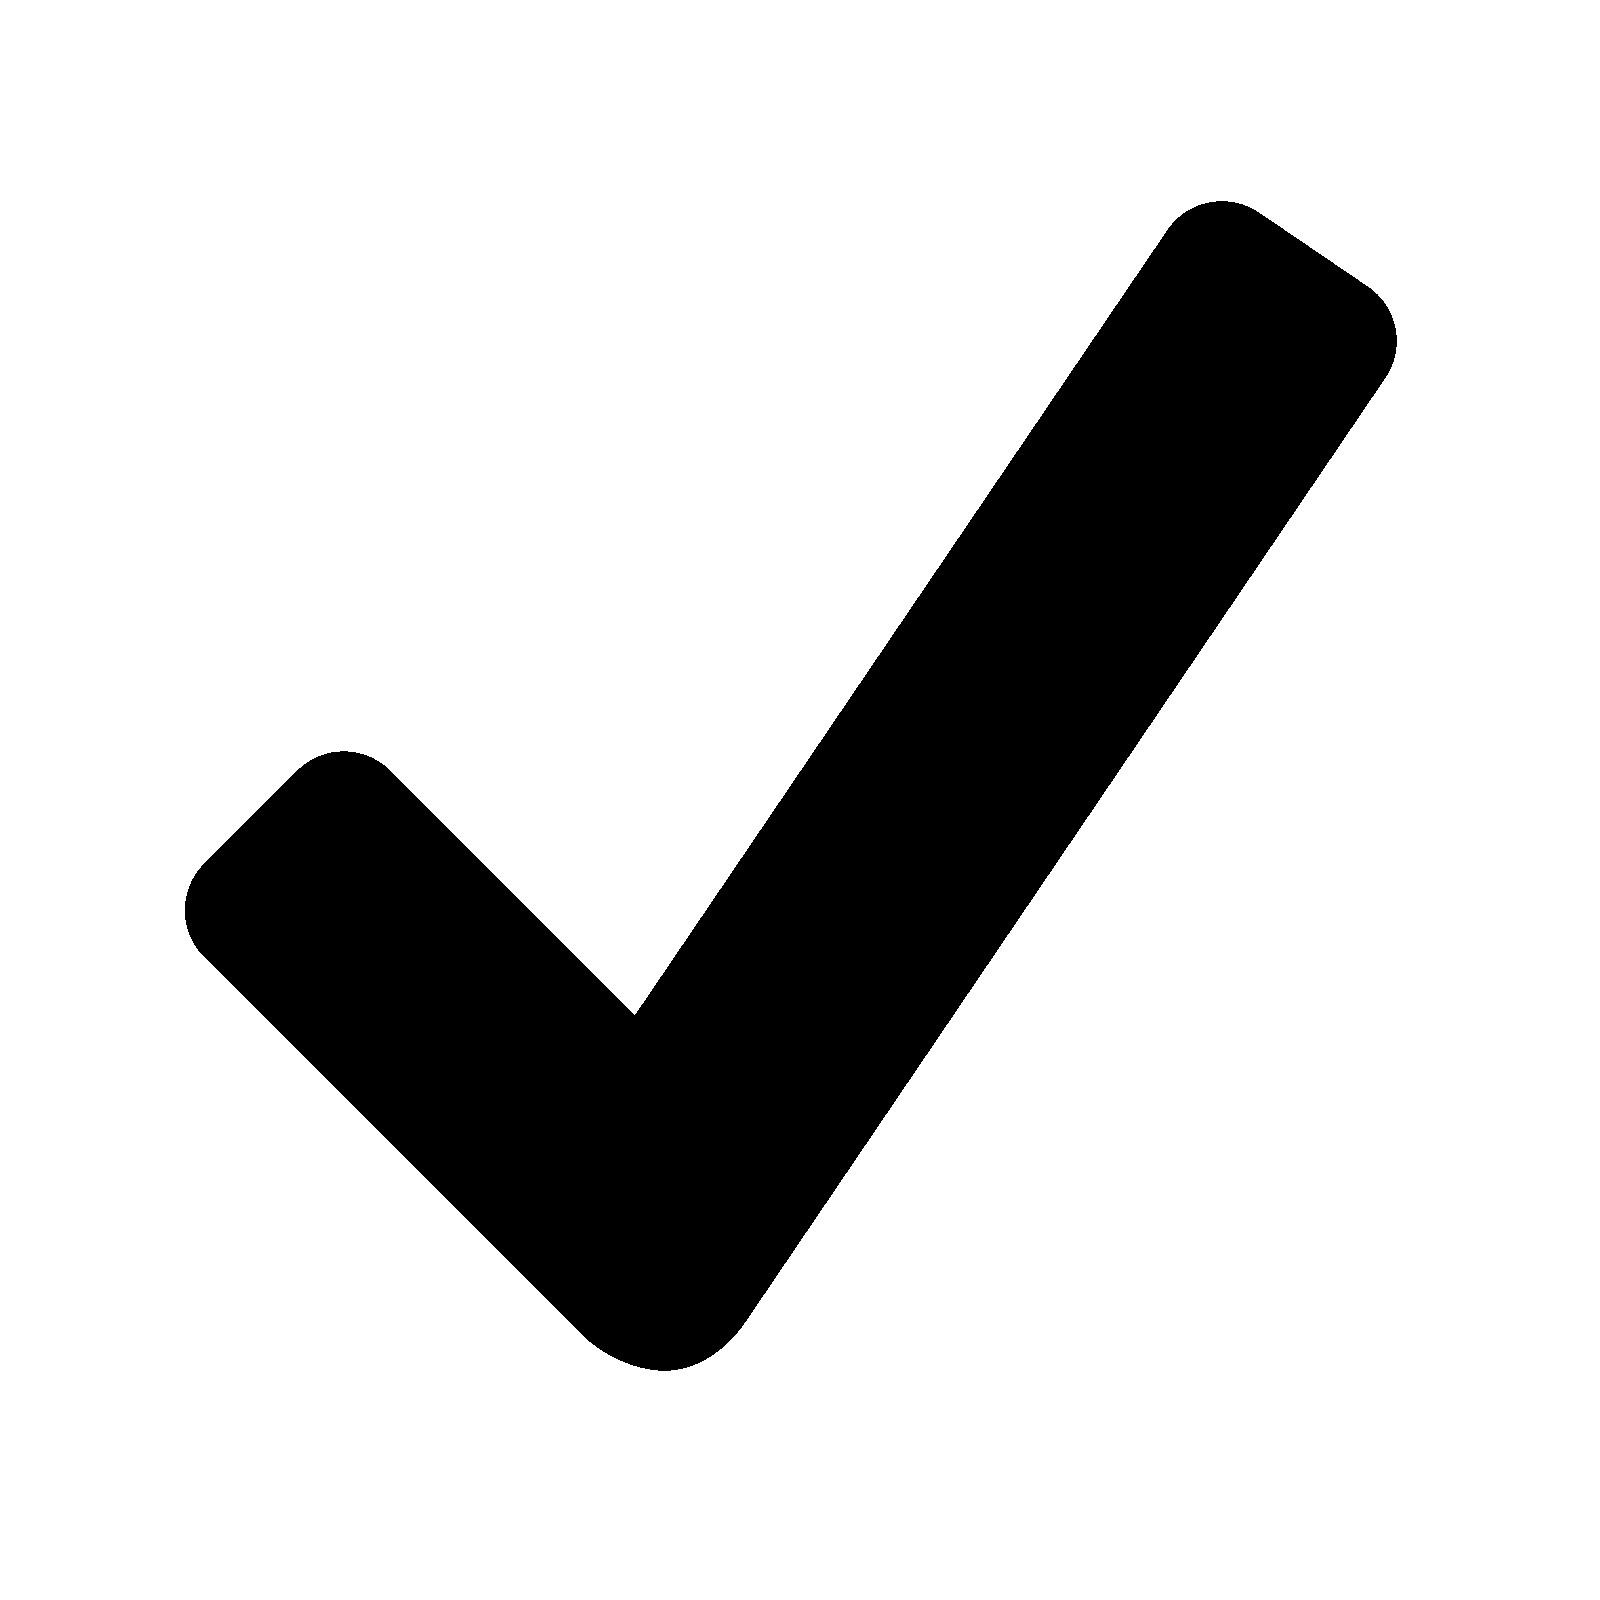 Download Free png Check Mark Clip Art Png 4 12 Check Mark.